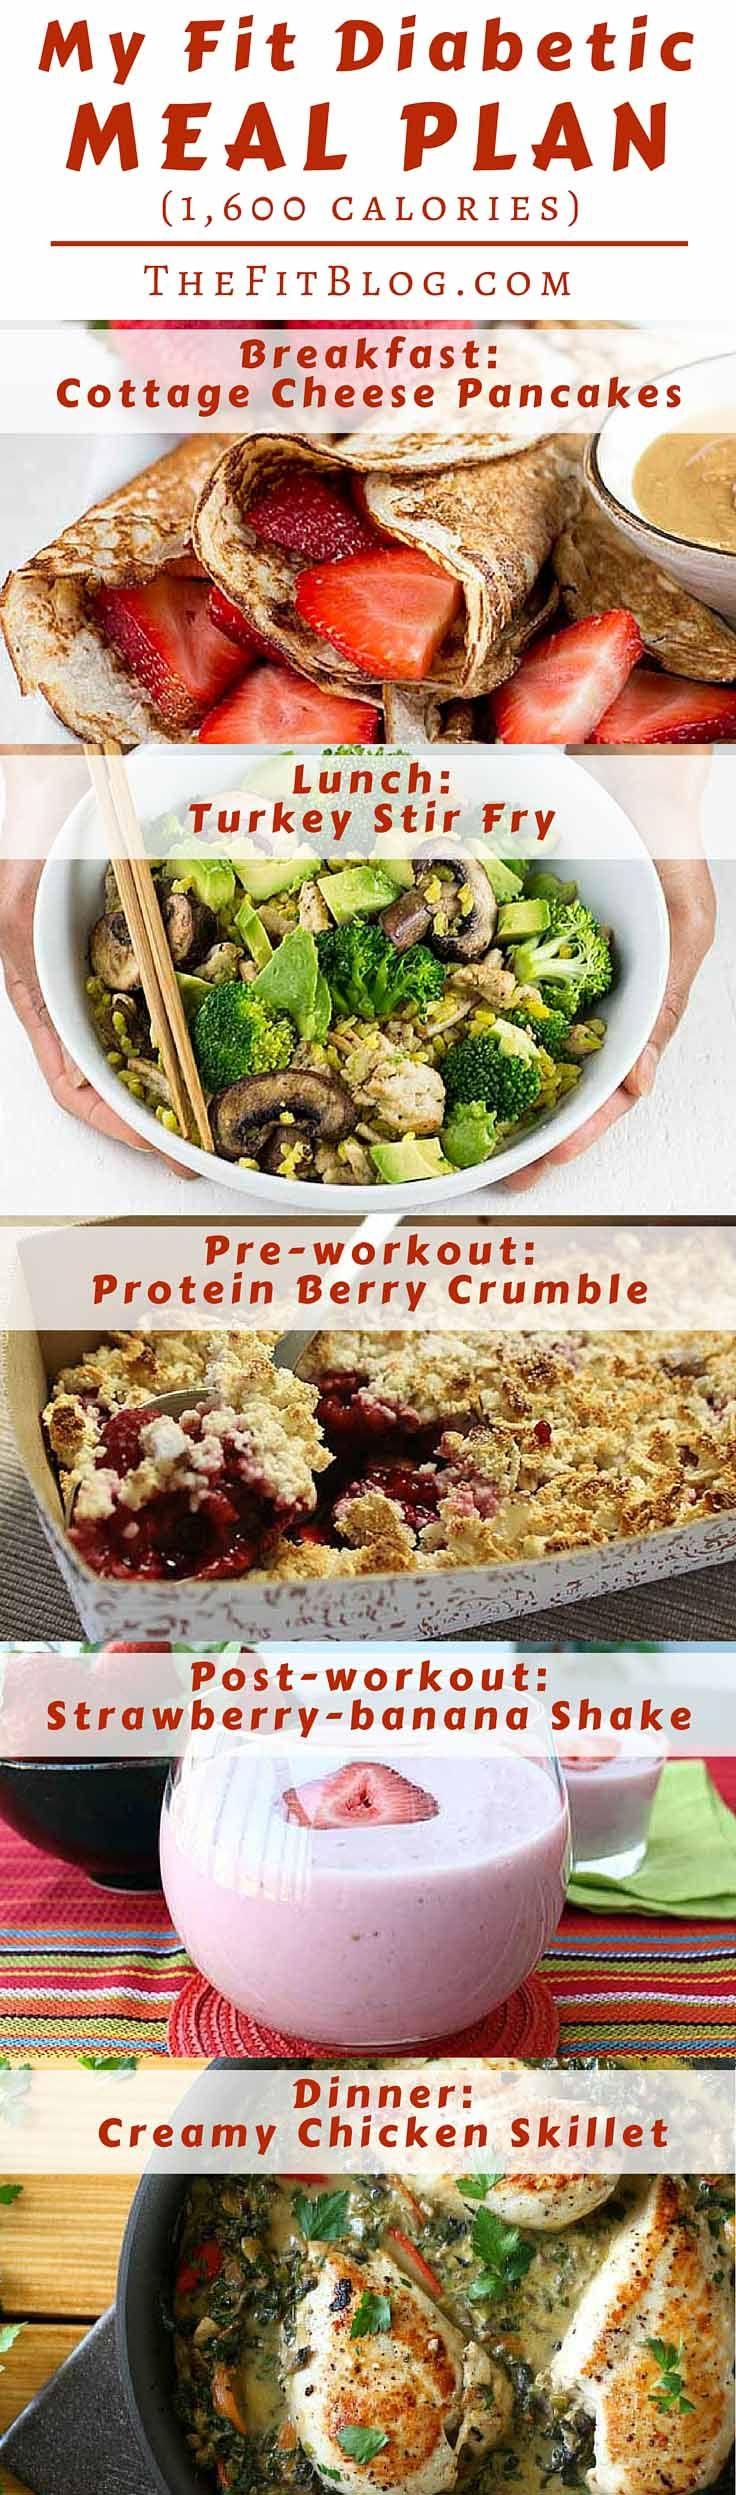 diabetic meal plan example | diets | pinterest | diabetic recipes